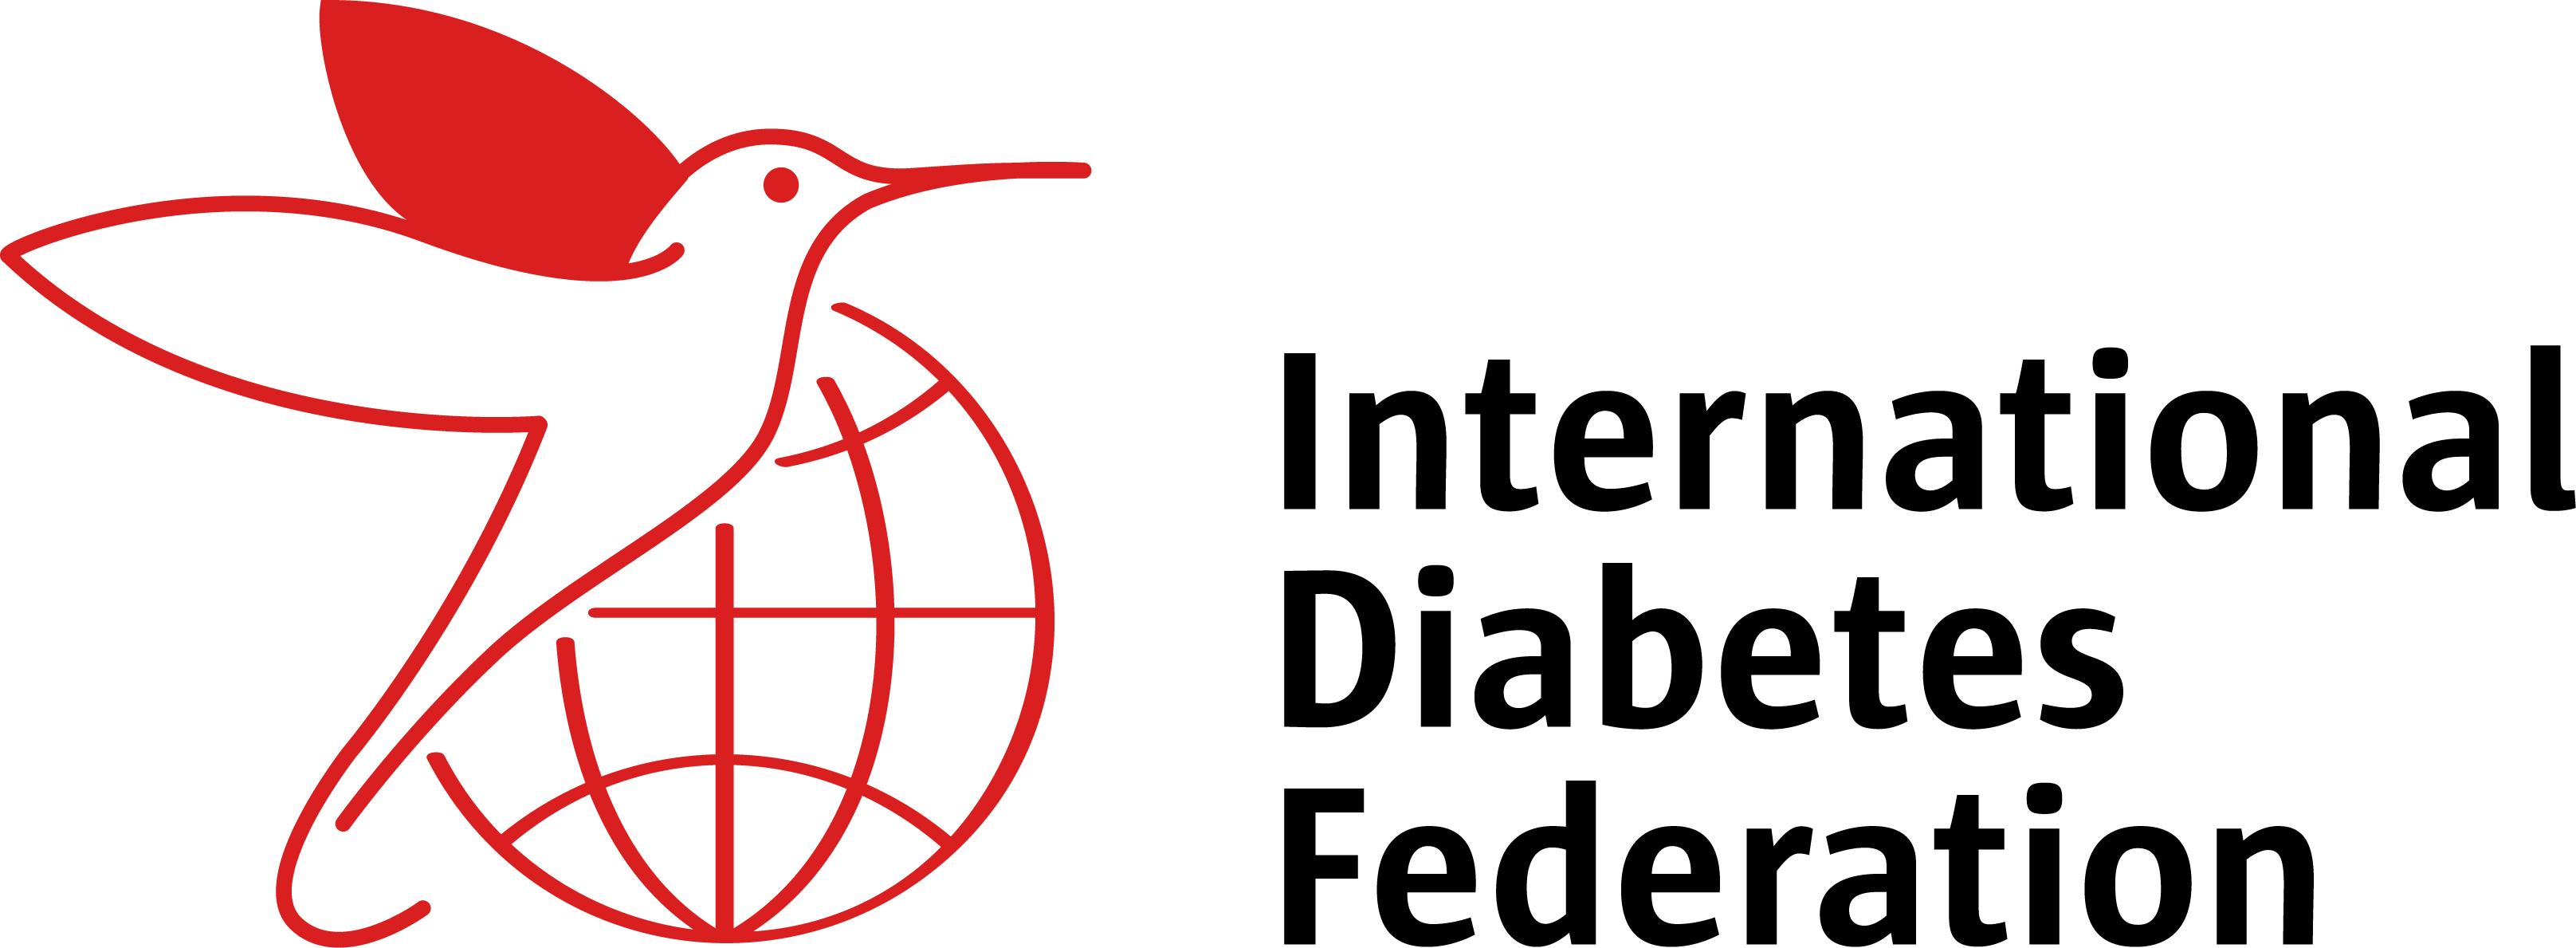 logo for International Diabetes Federation